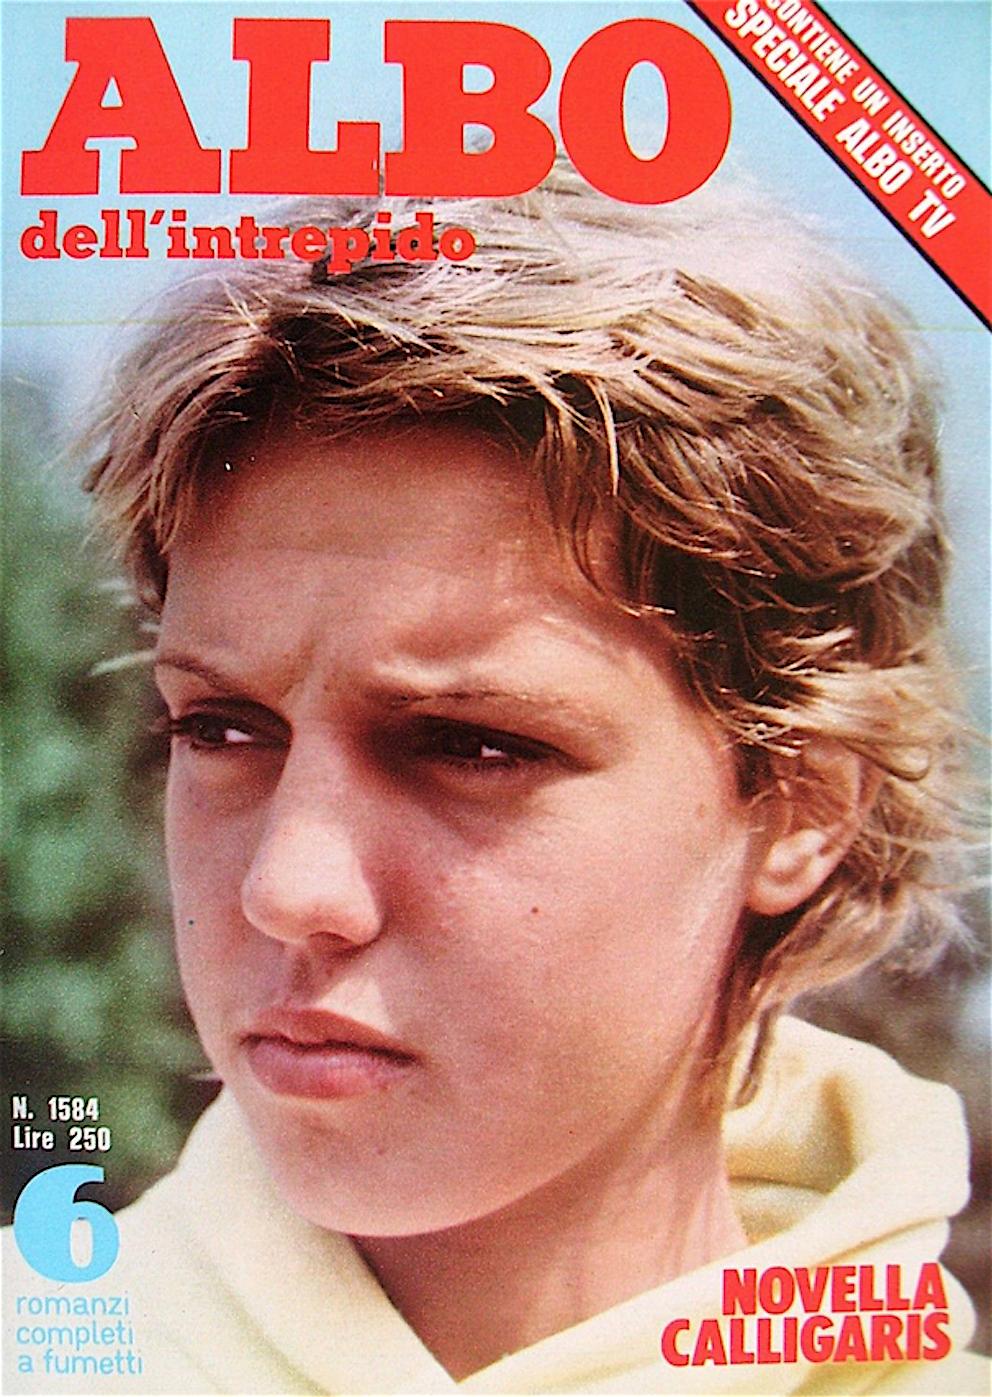 Novella calligaris sport nuoto curiosando anni 70 novellagalligariscopertinaanni70 novella galligaris thecheapjerseys Choice Image